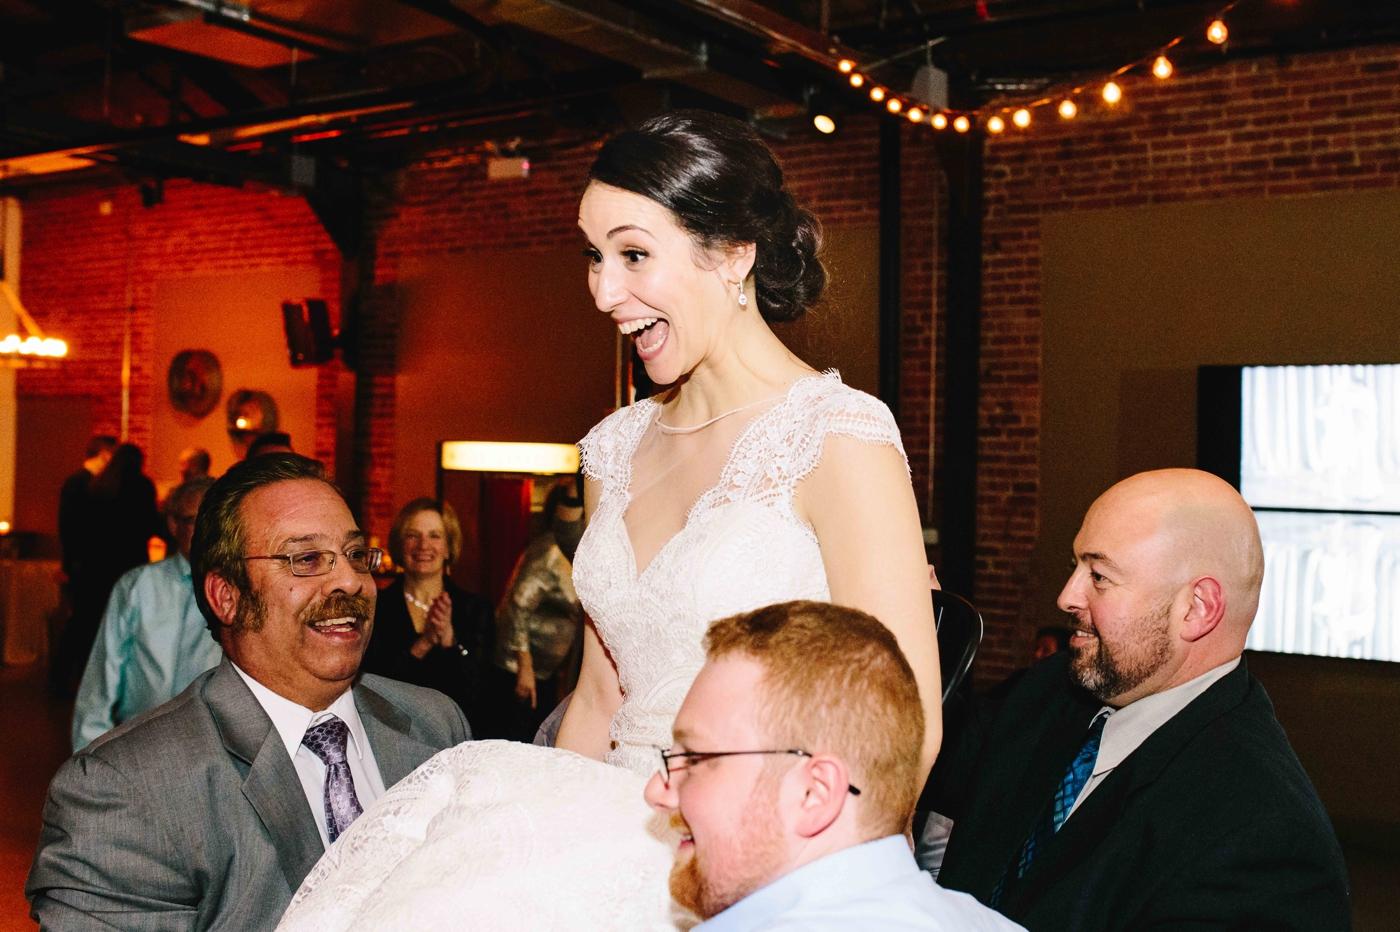 chicago-fine-art-wedding-photography-lintelman52